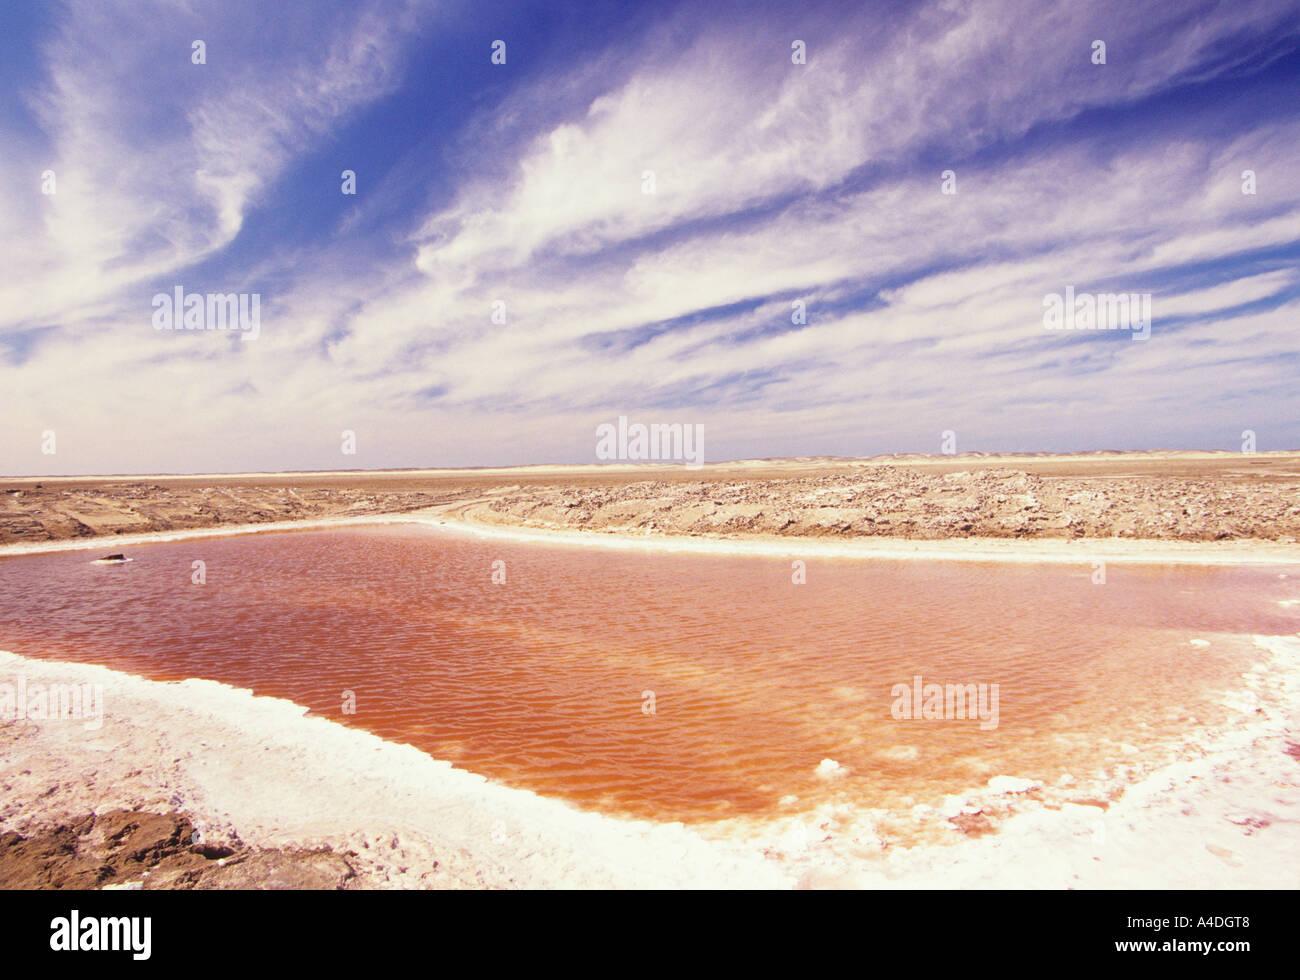 Red bloom of micro organisms in salt pan, Namibia - Stock Image